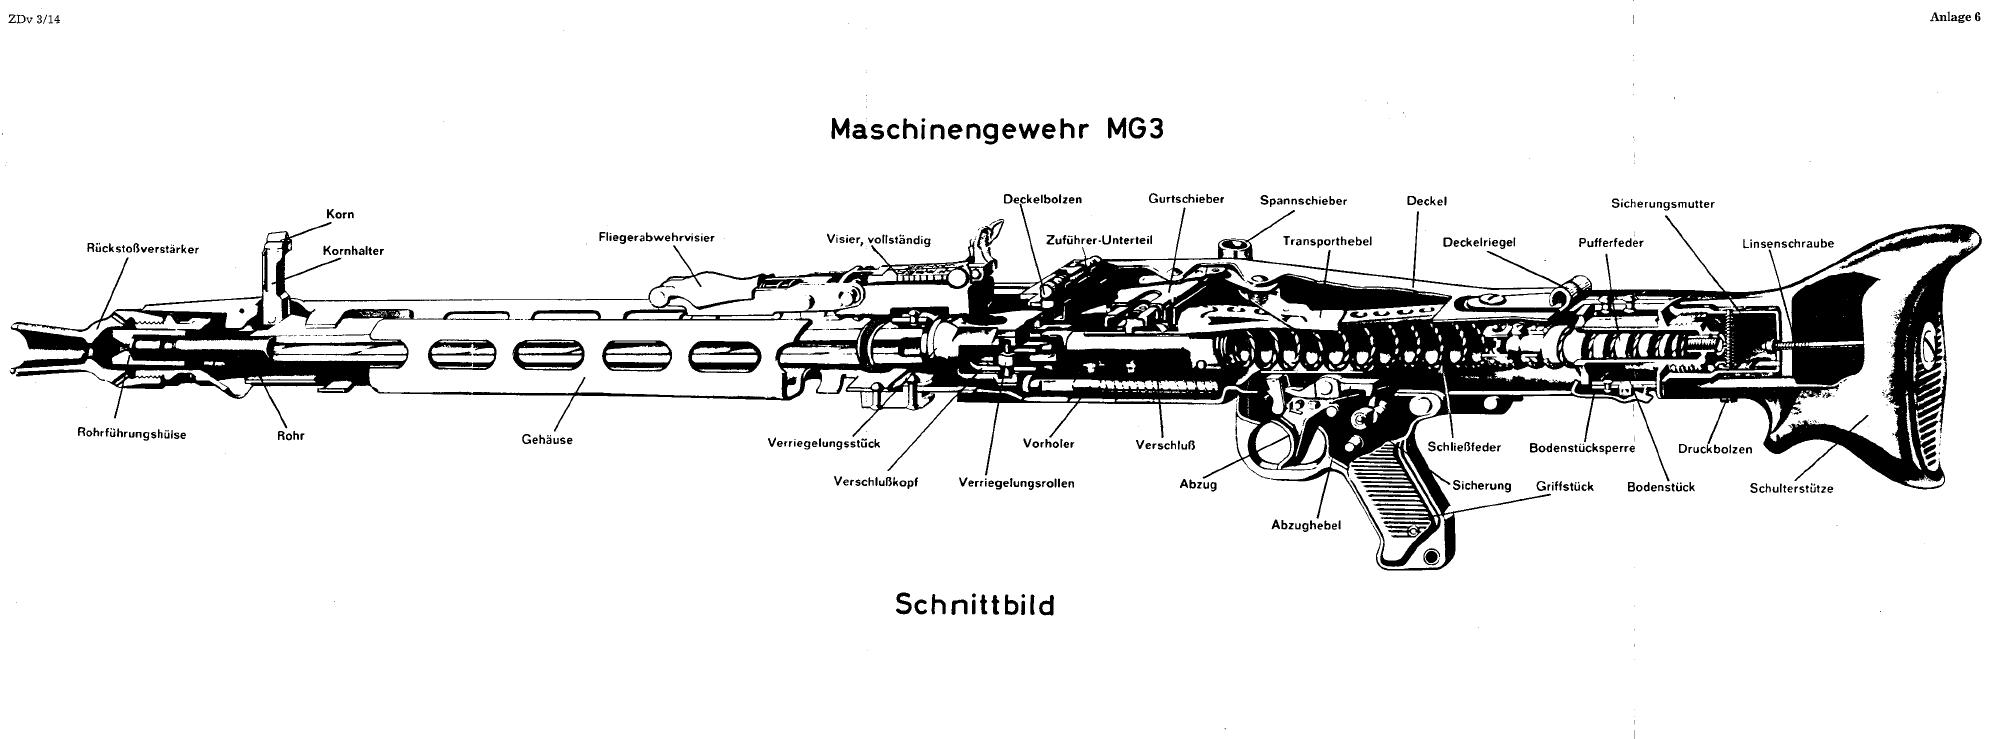 IMAGE(http://upload.wikimedia.org/wikipedia/commons/a/ad/Schnittbild.MG3.jpg)